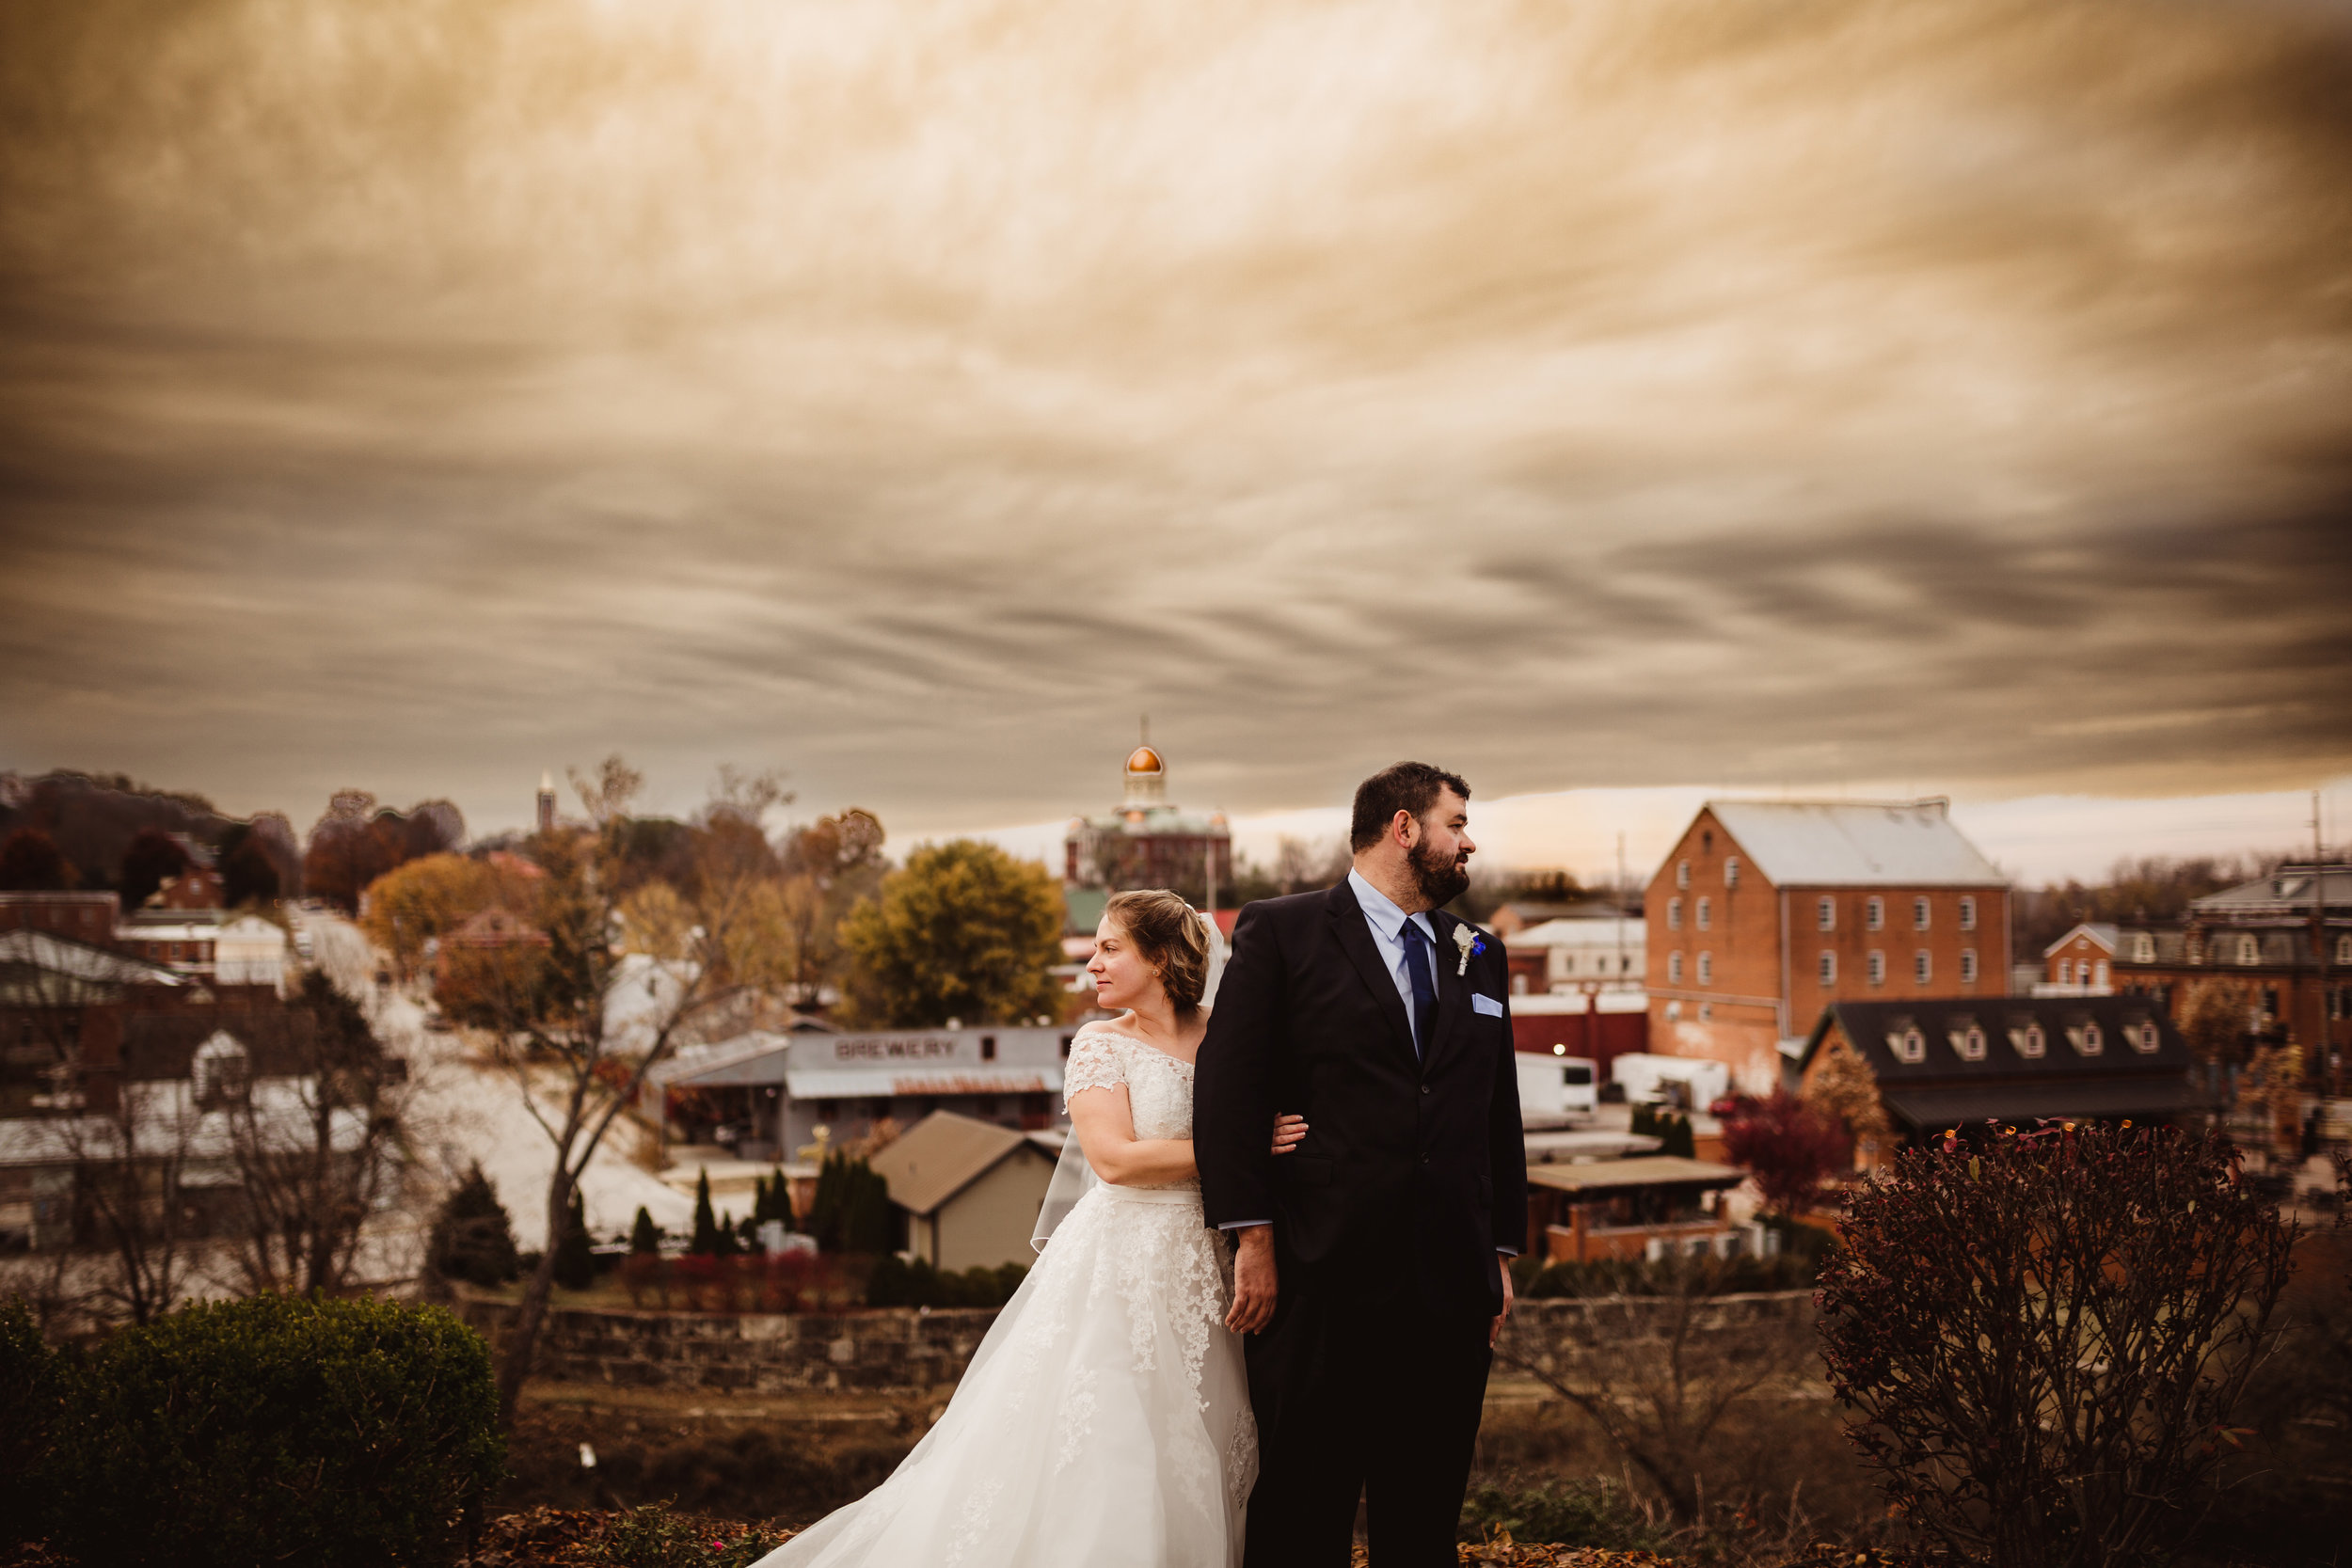 Jefferson city photographer, missouri photographer, elopement photographer, hermann, hermanhoff, herman wedding